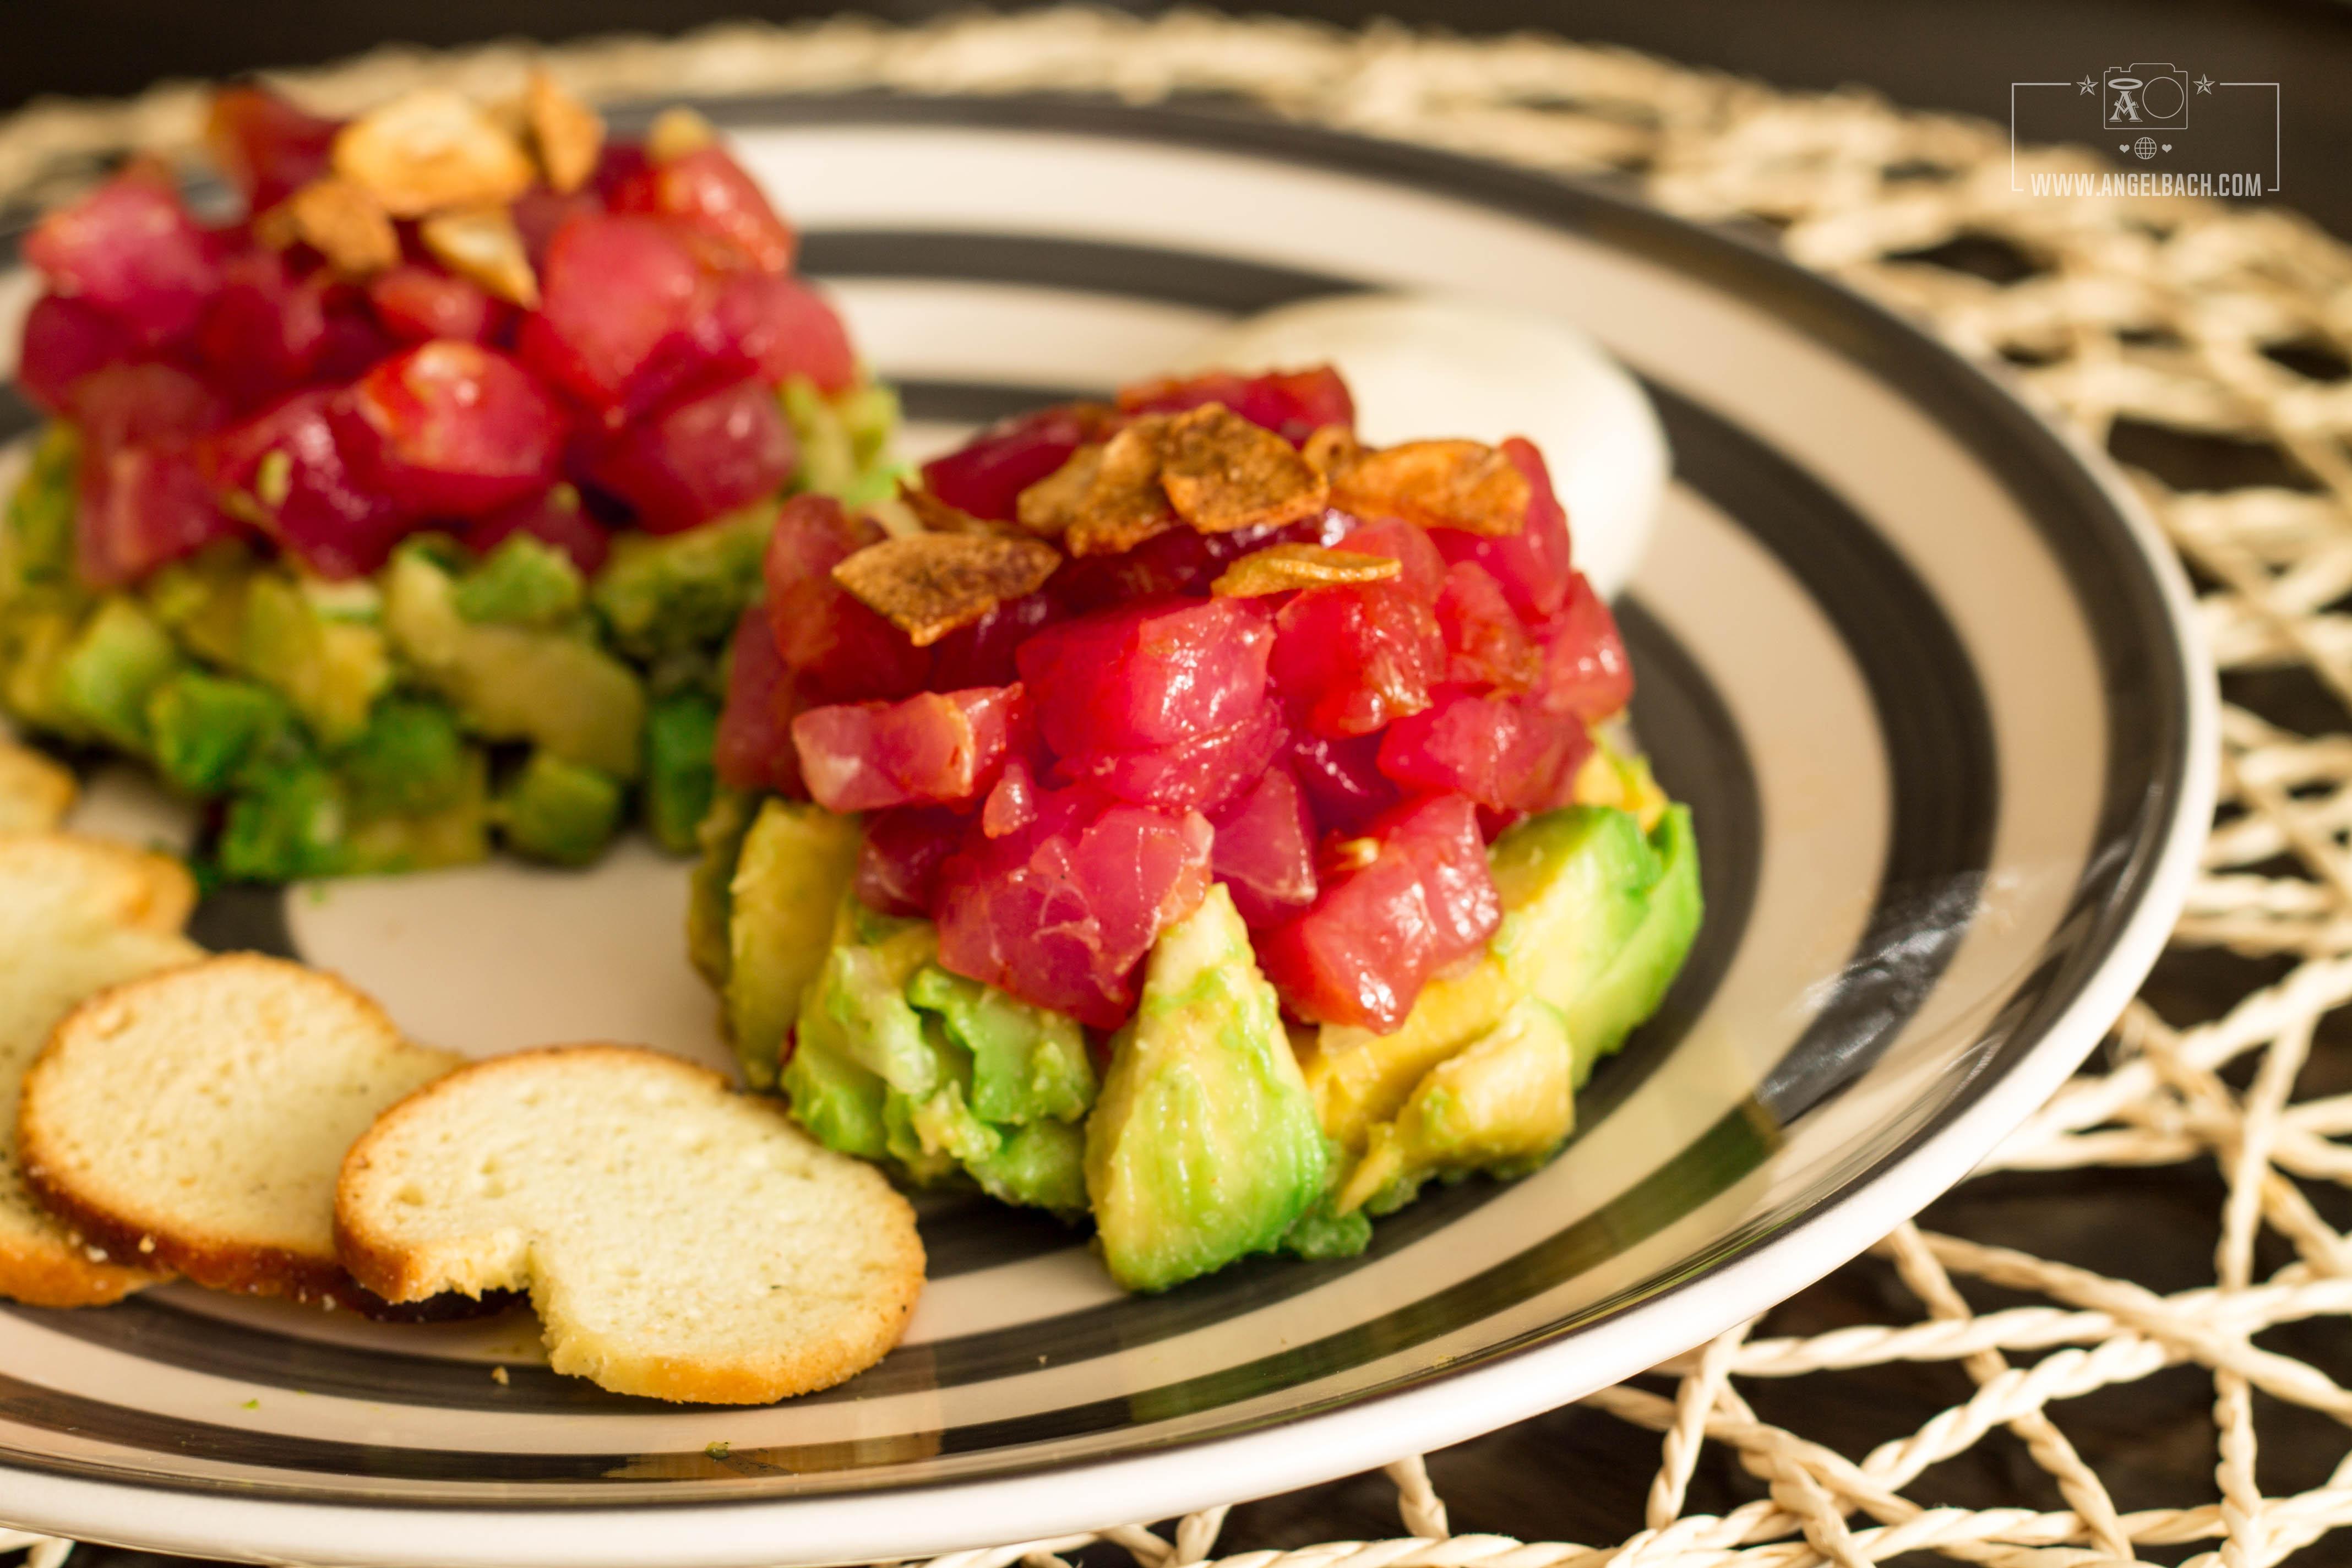 tuna tartare, crackers, avocado, starters, Chef Esben, dinner, Husband's Kitchen